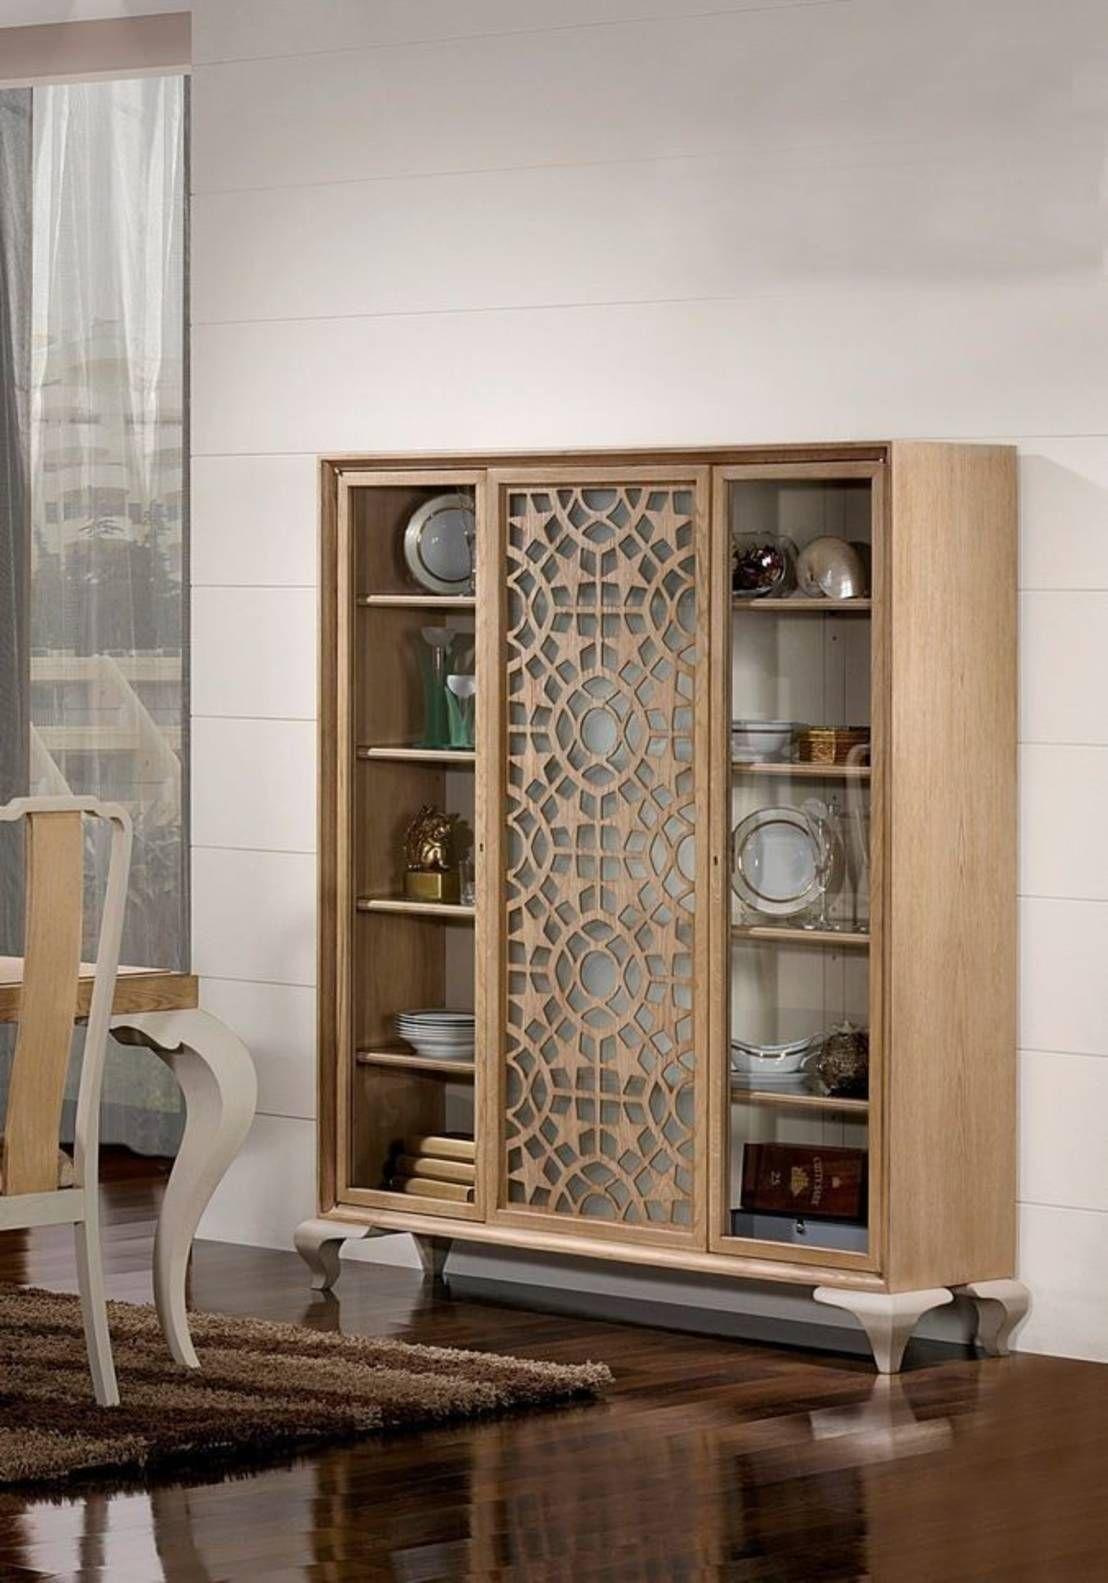 10 bonitas alacenas para decorar tu vivienda dise o for Muebles cocina comedor modernos